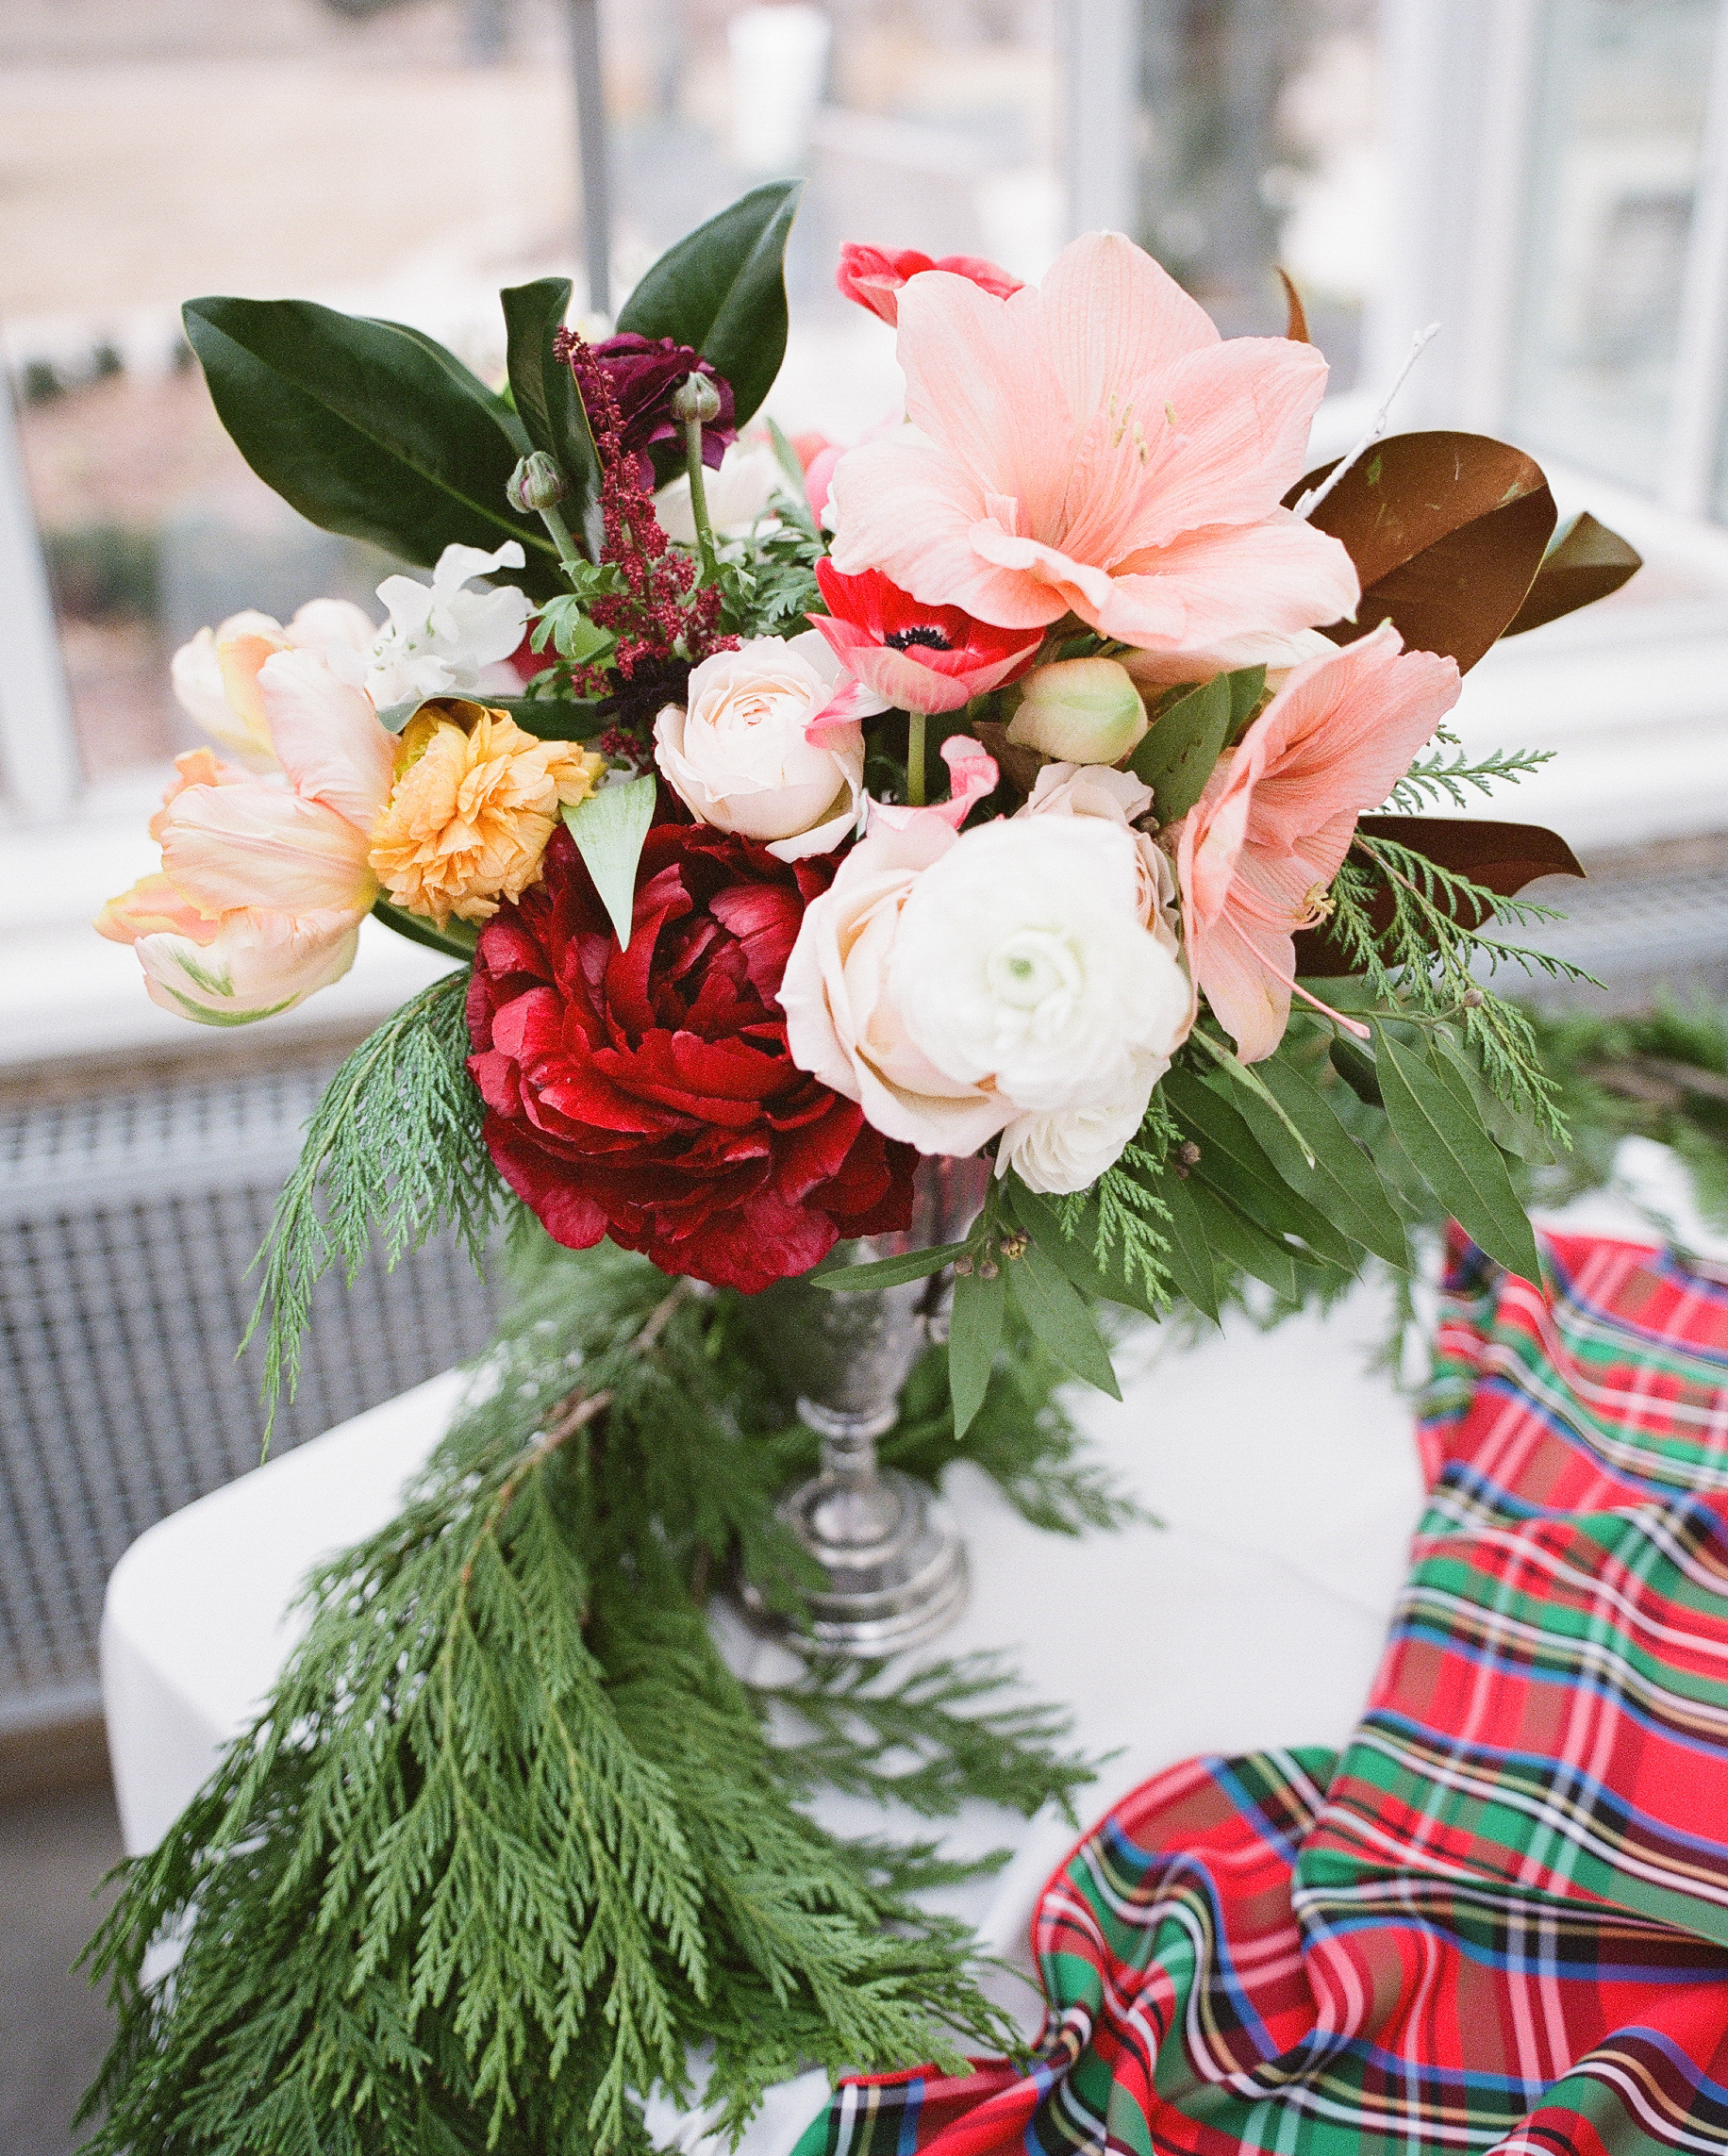 jessie-justin-wedding-flowers-51-s112135-0915.jpg